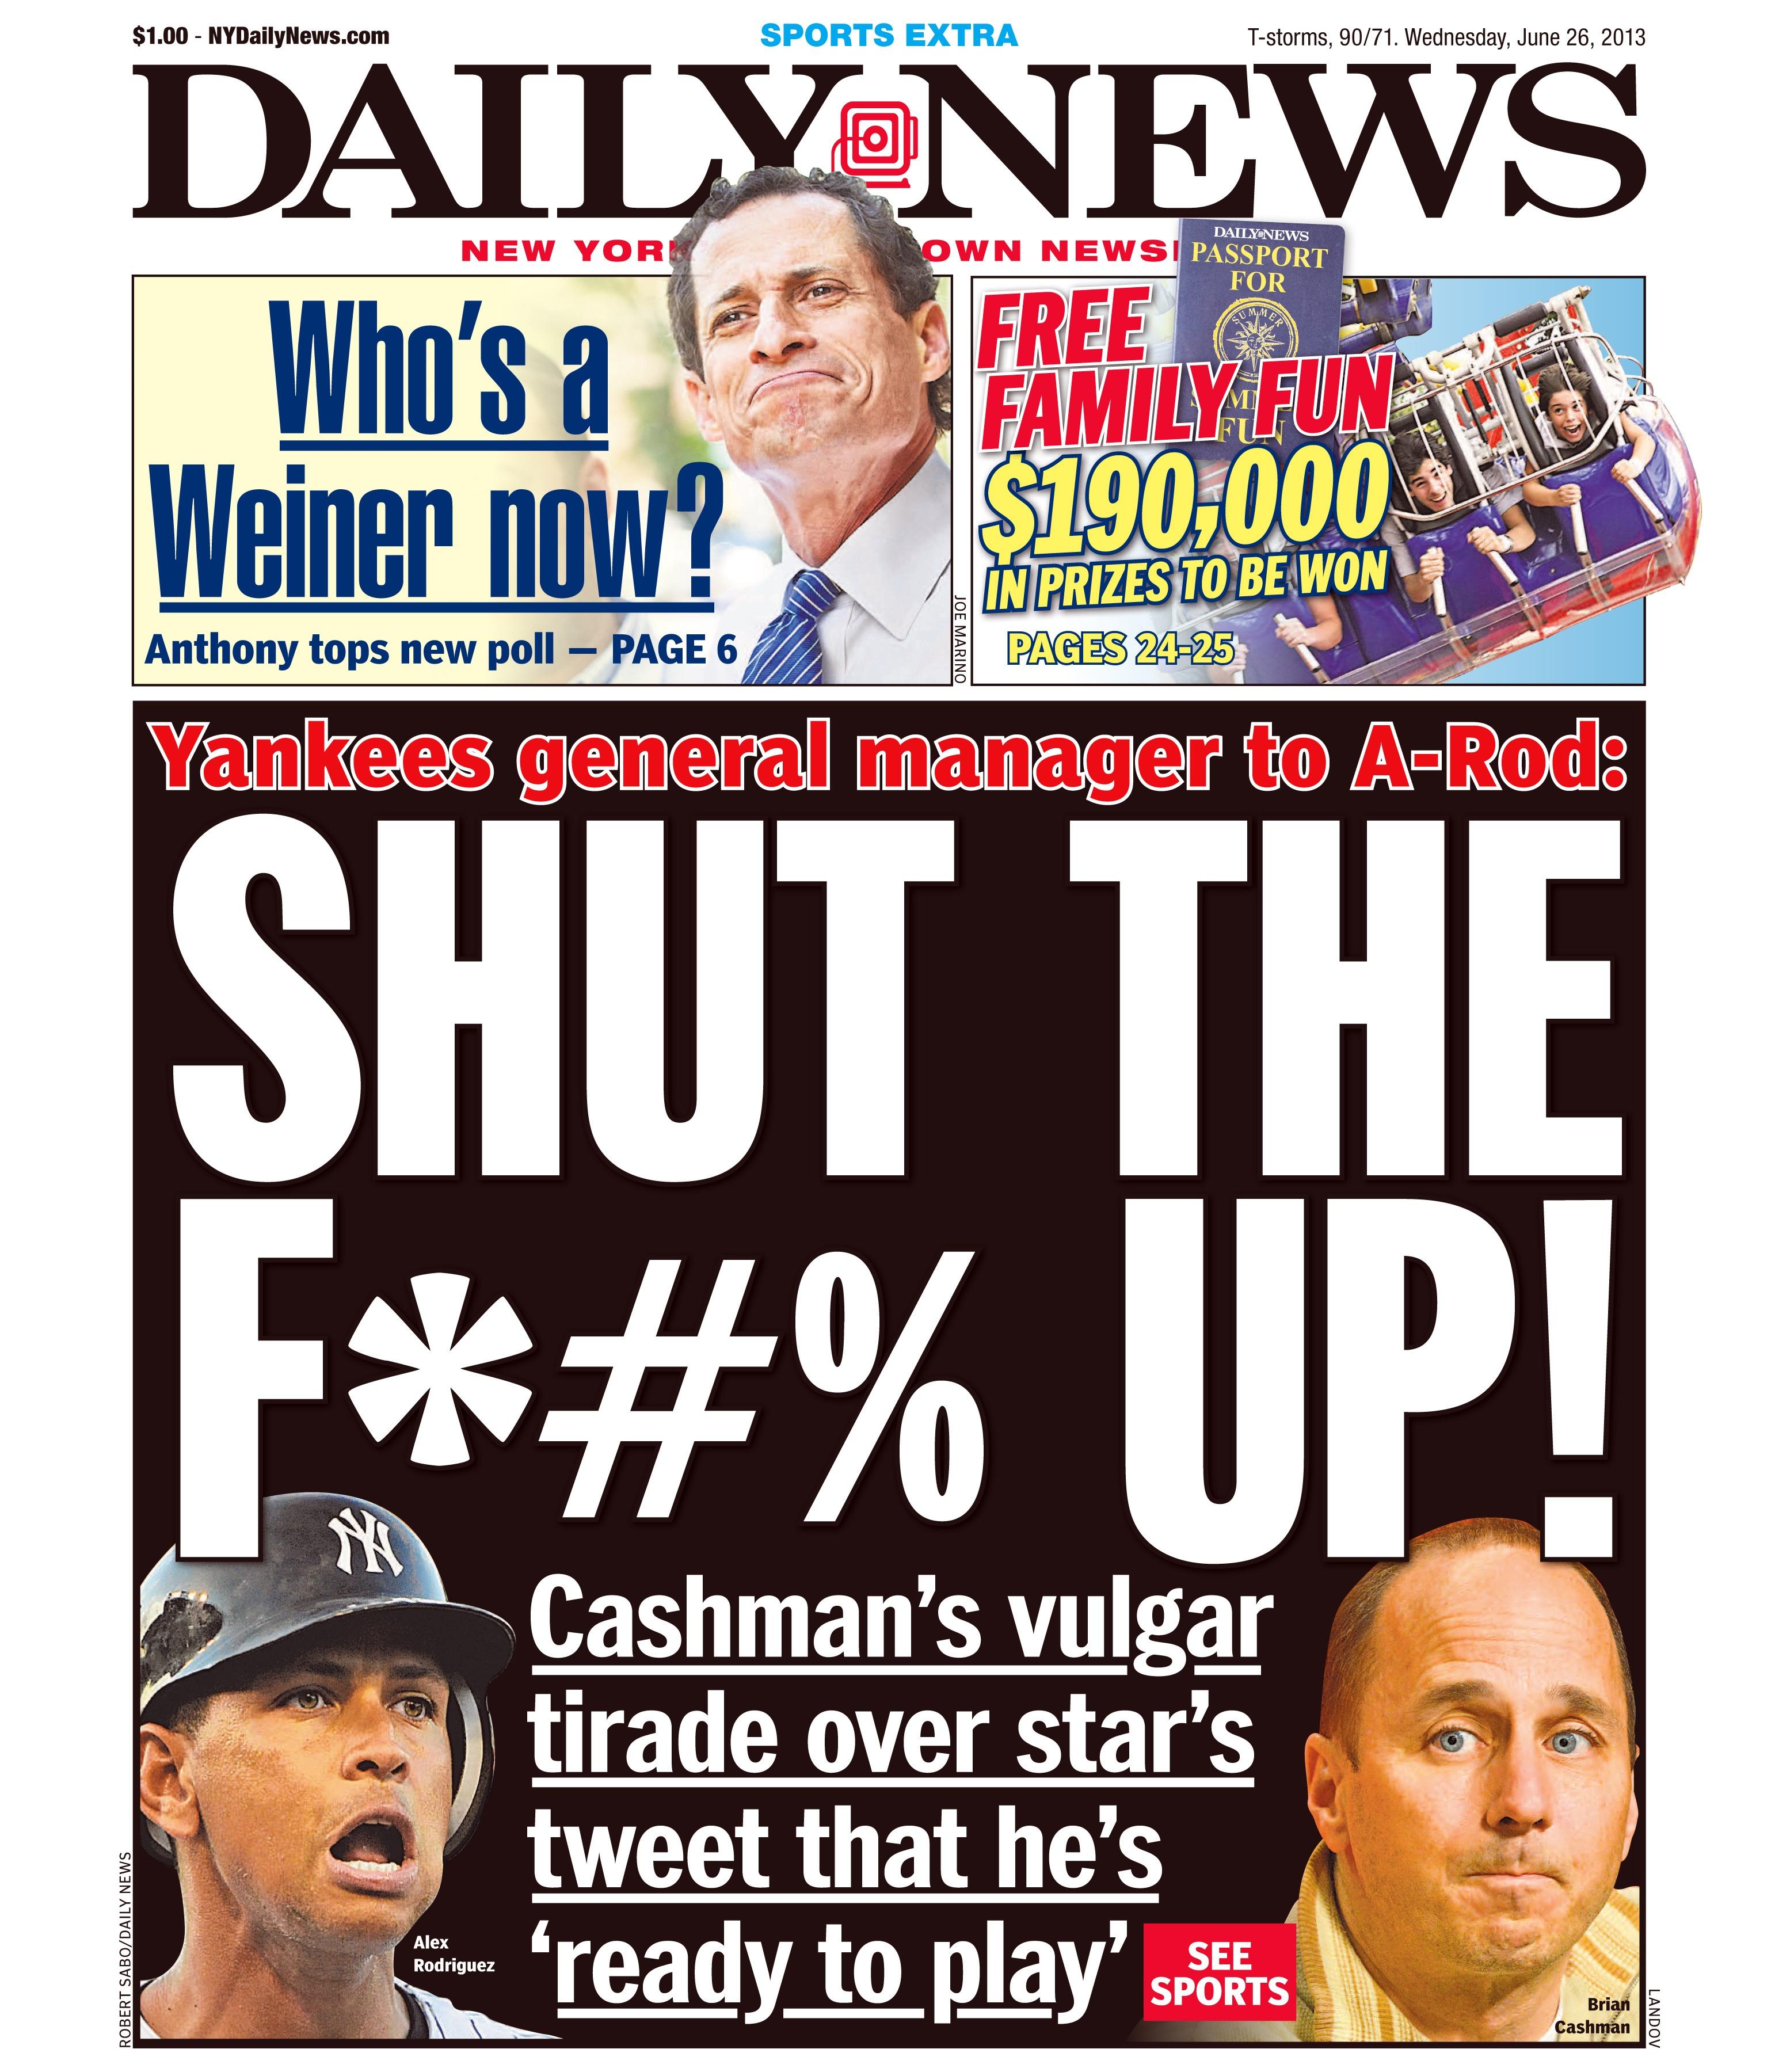 Brian Cashman, New York Yankees